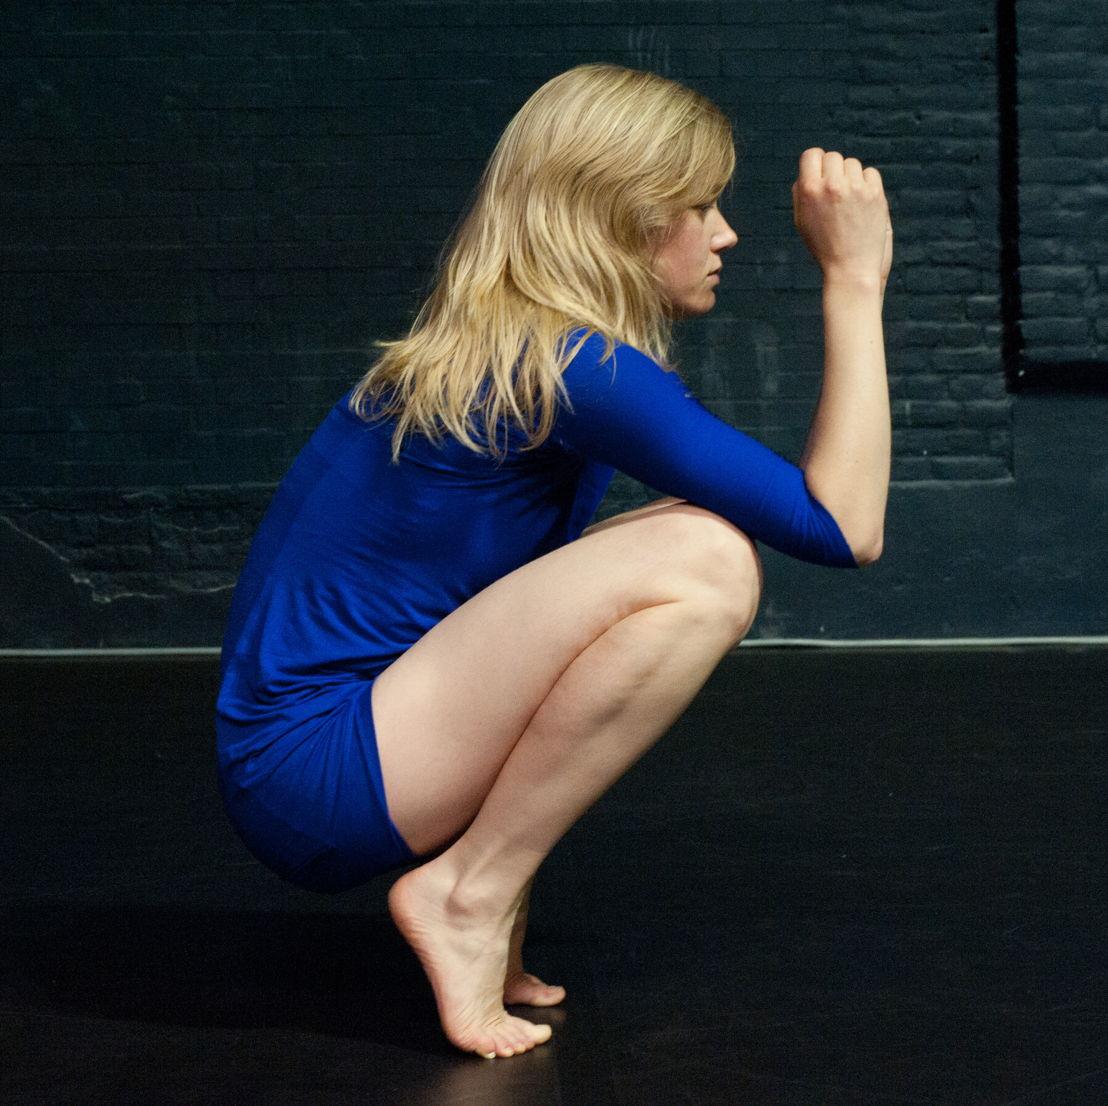 Charlotte Vanden Eynde - Shapeless + I'm Sorry It's... - 21 > 22/01 - © Constance Neuenschwander